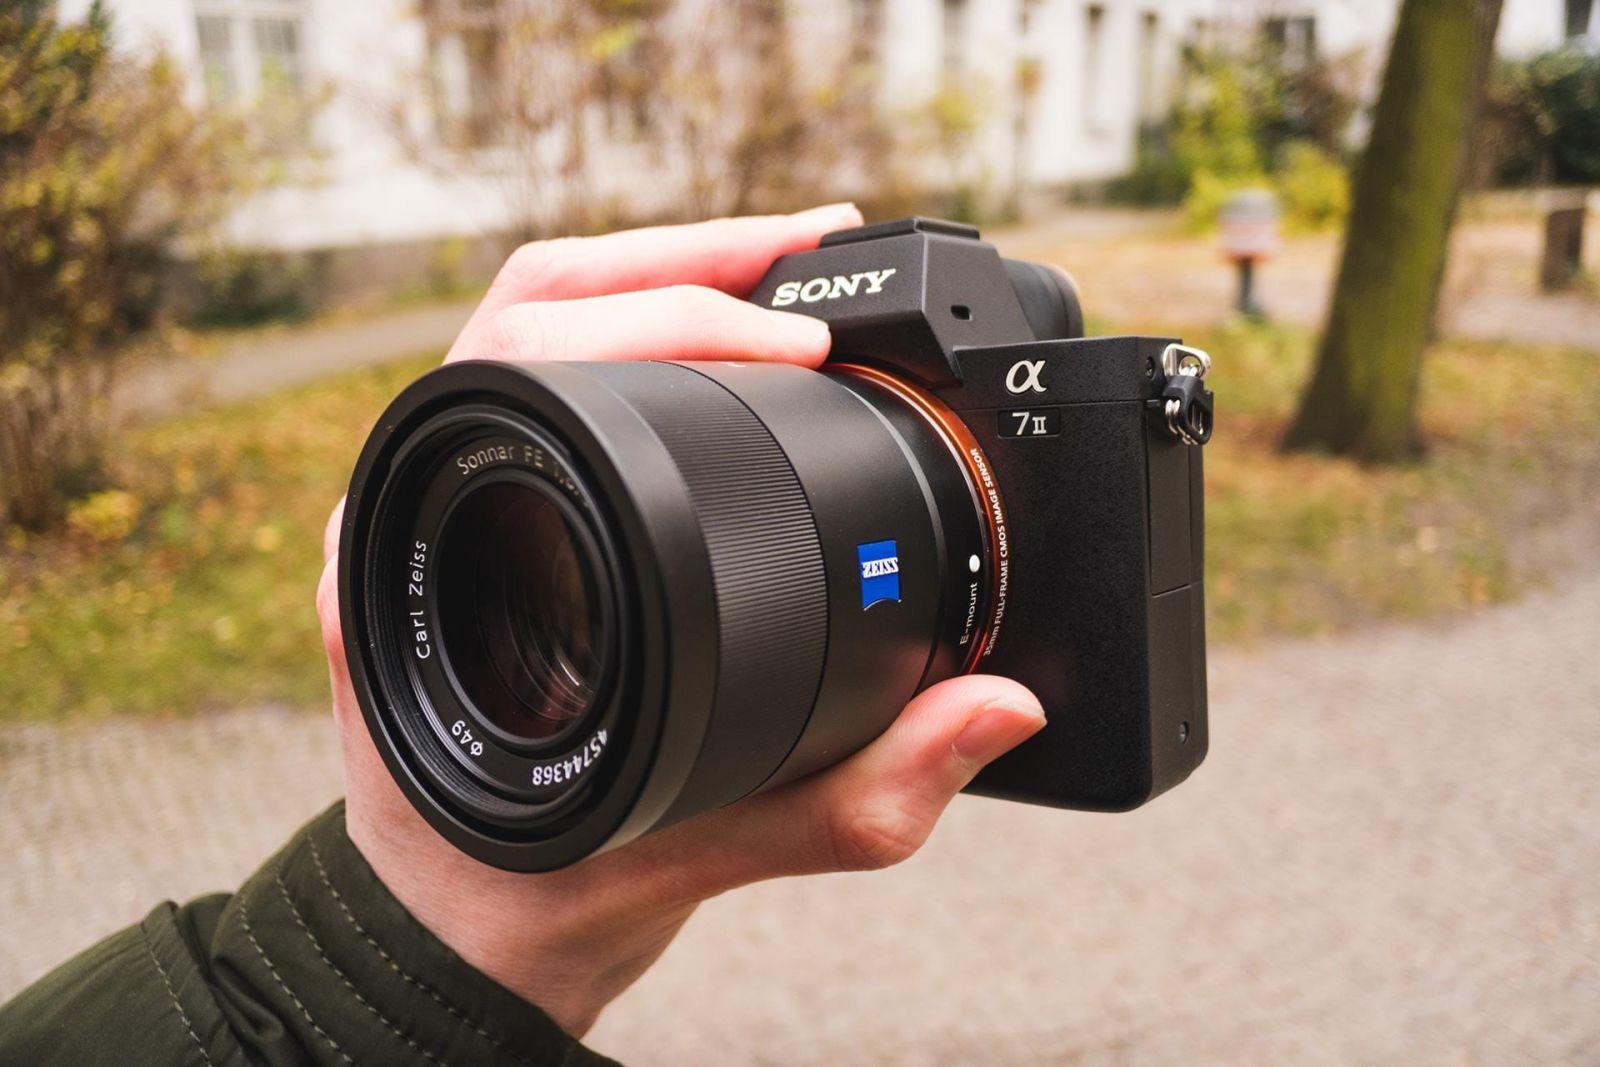 Sony обновила ПО для камер α9 и α7 множеством возможностей для съемки (a7 ii front)